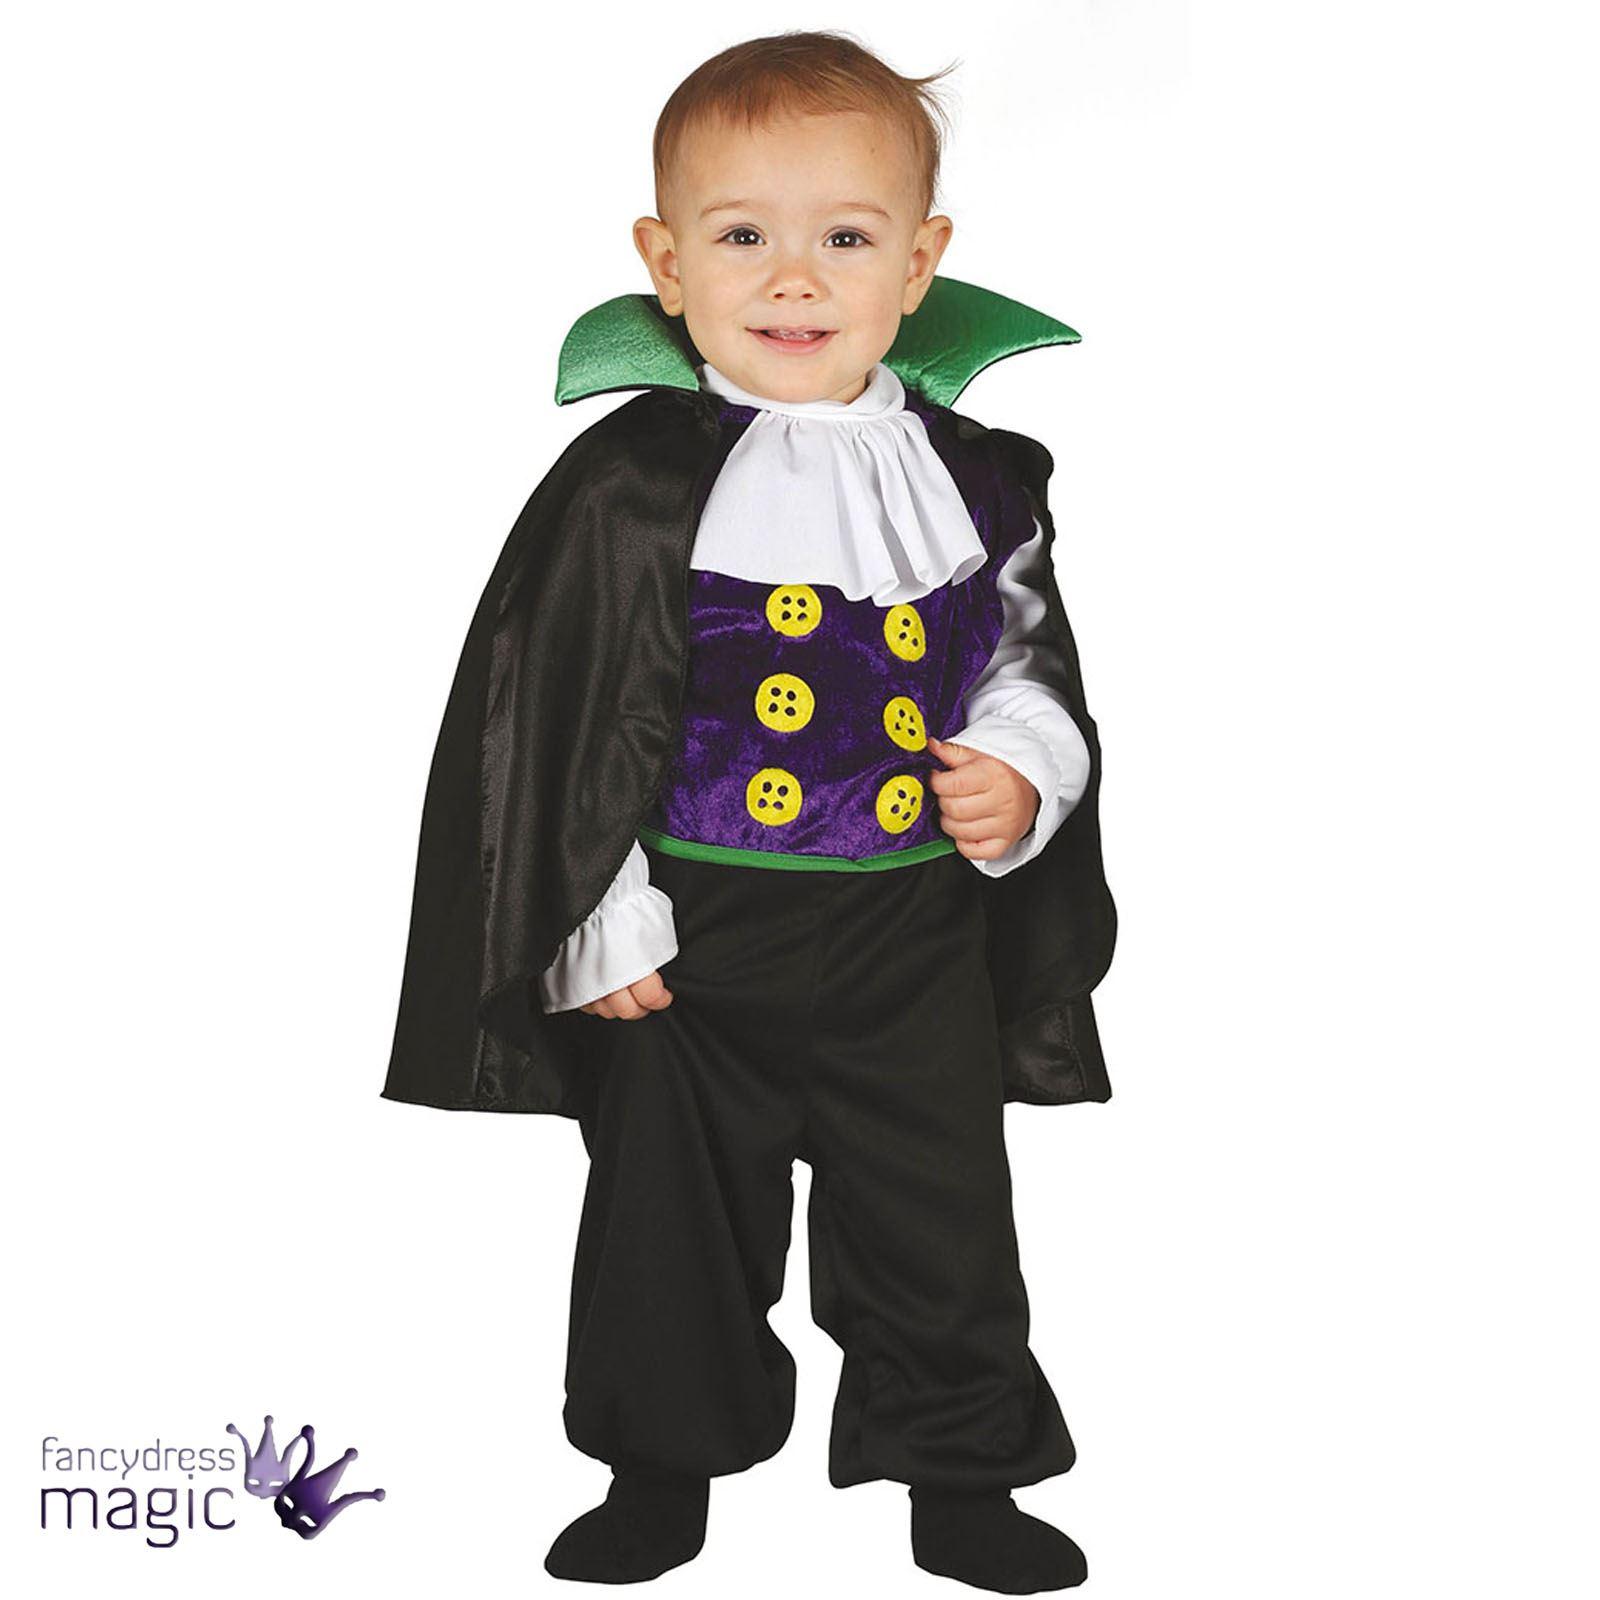 jungen baby kleinkind halloween vampir dracula kost m kleid outfit s umhang ebay. Black Bedroom Furniture Sets. Home Design Ideas